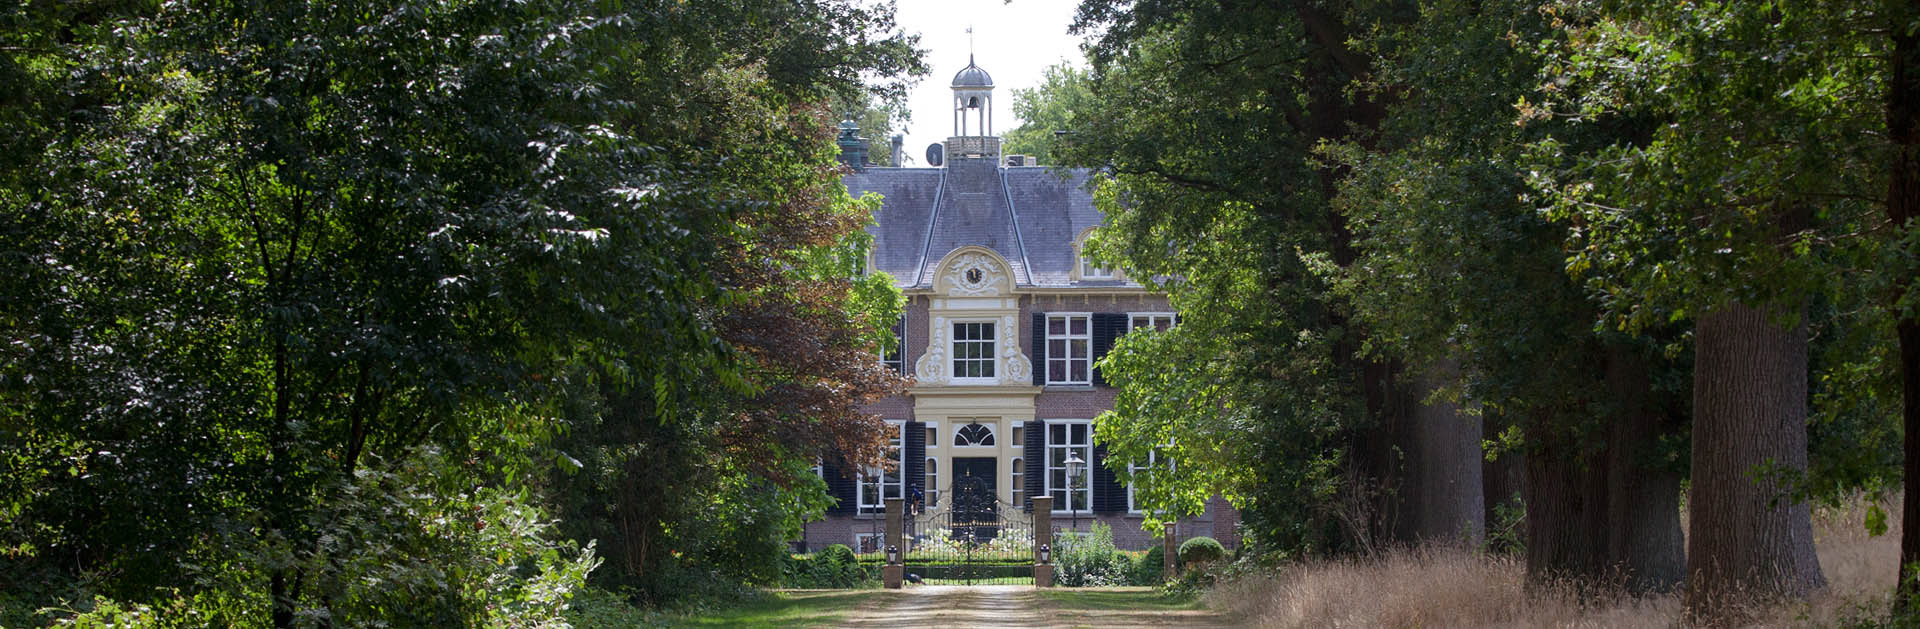 Huis Onstein - Linde Regio Achterhoek - Liemers